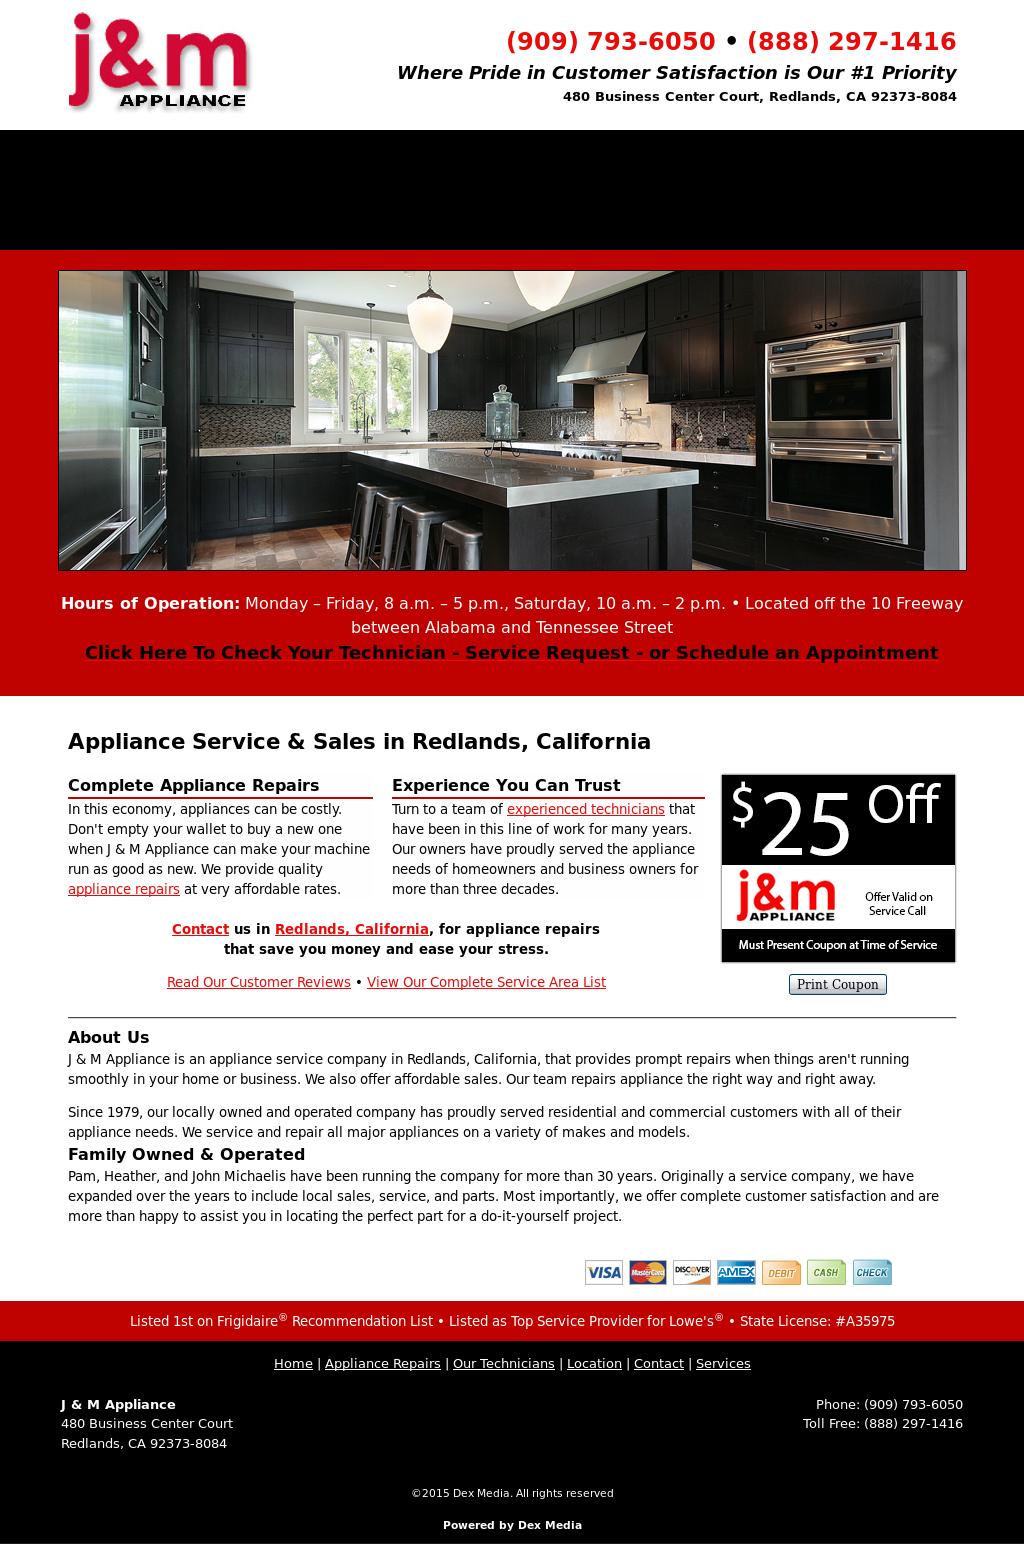 J & M Appliances Competitors, Revenue and Employees - Owler